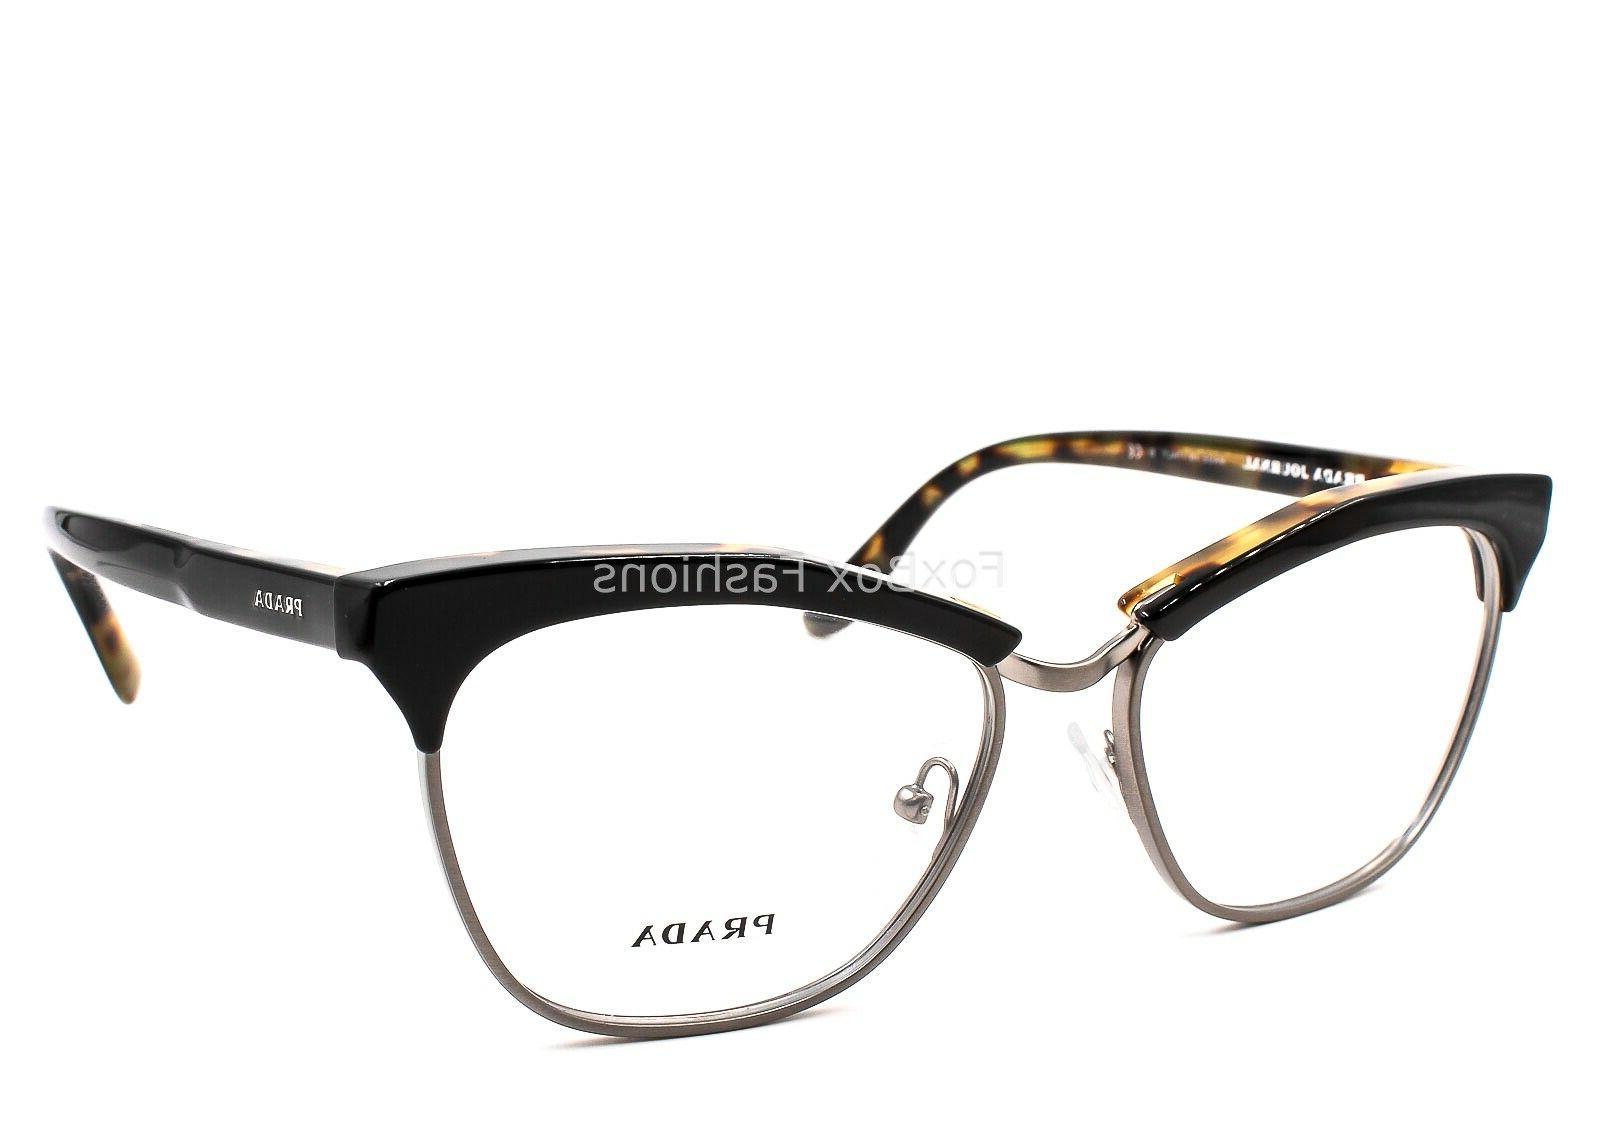 vpr 14s nai 1o1 clubmaster eyeglasses frames